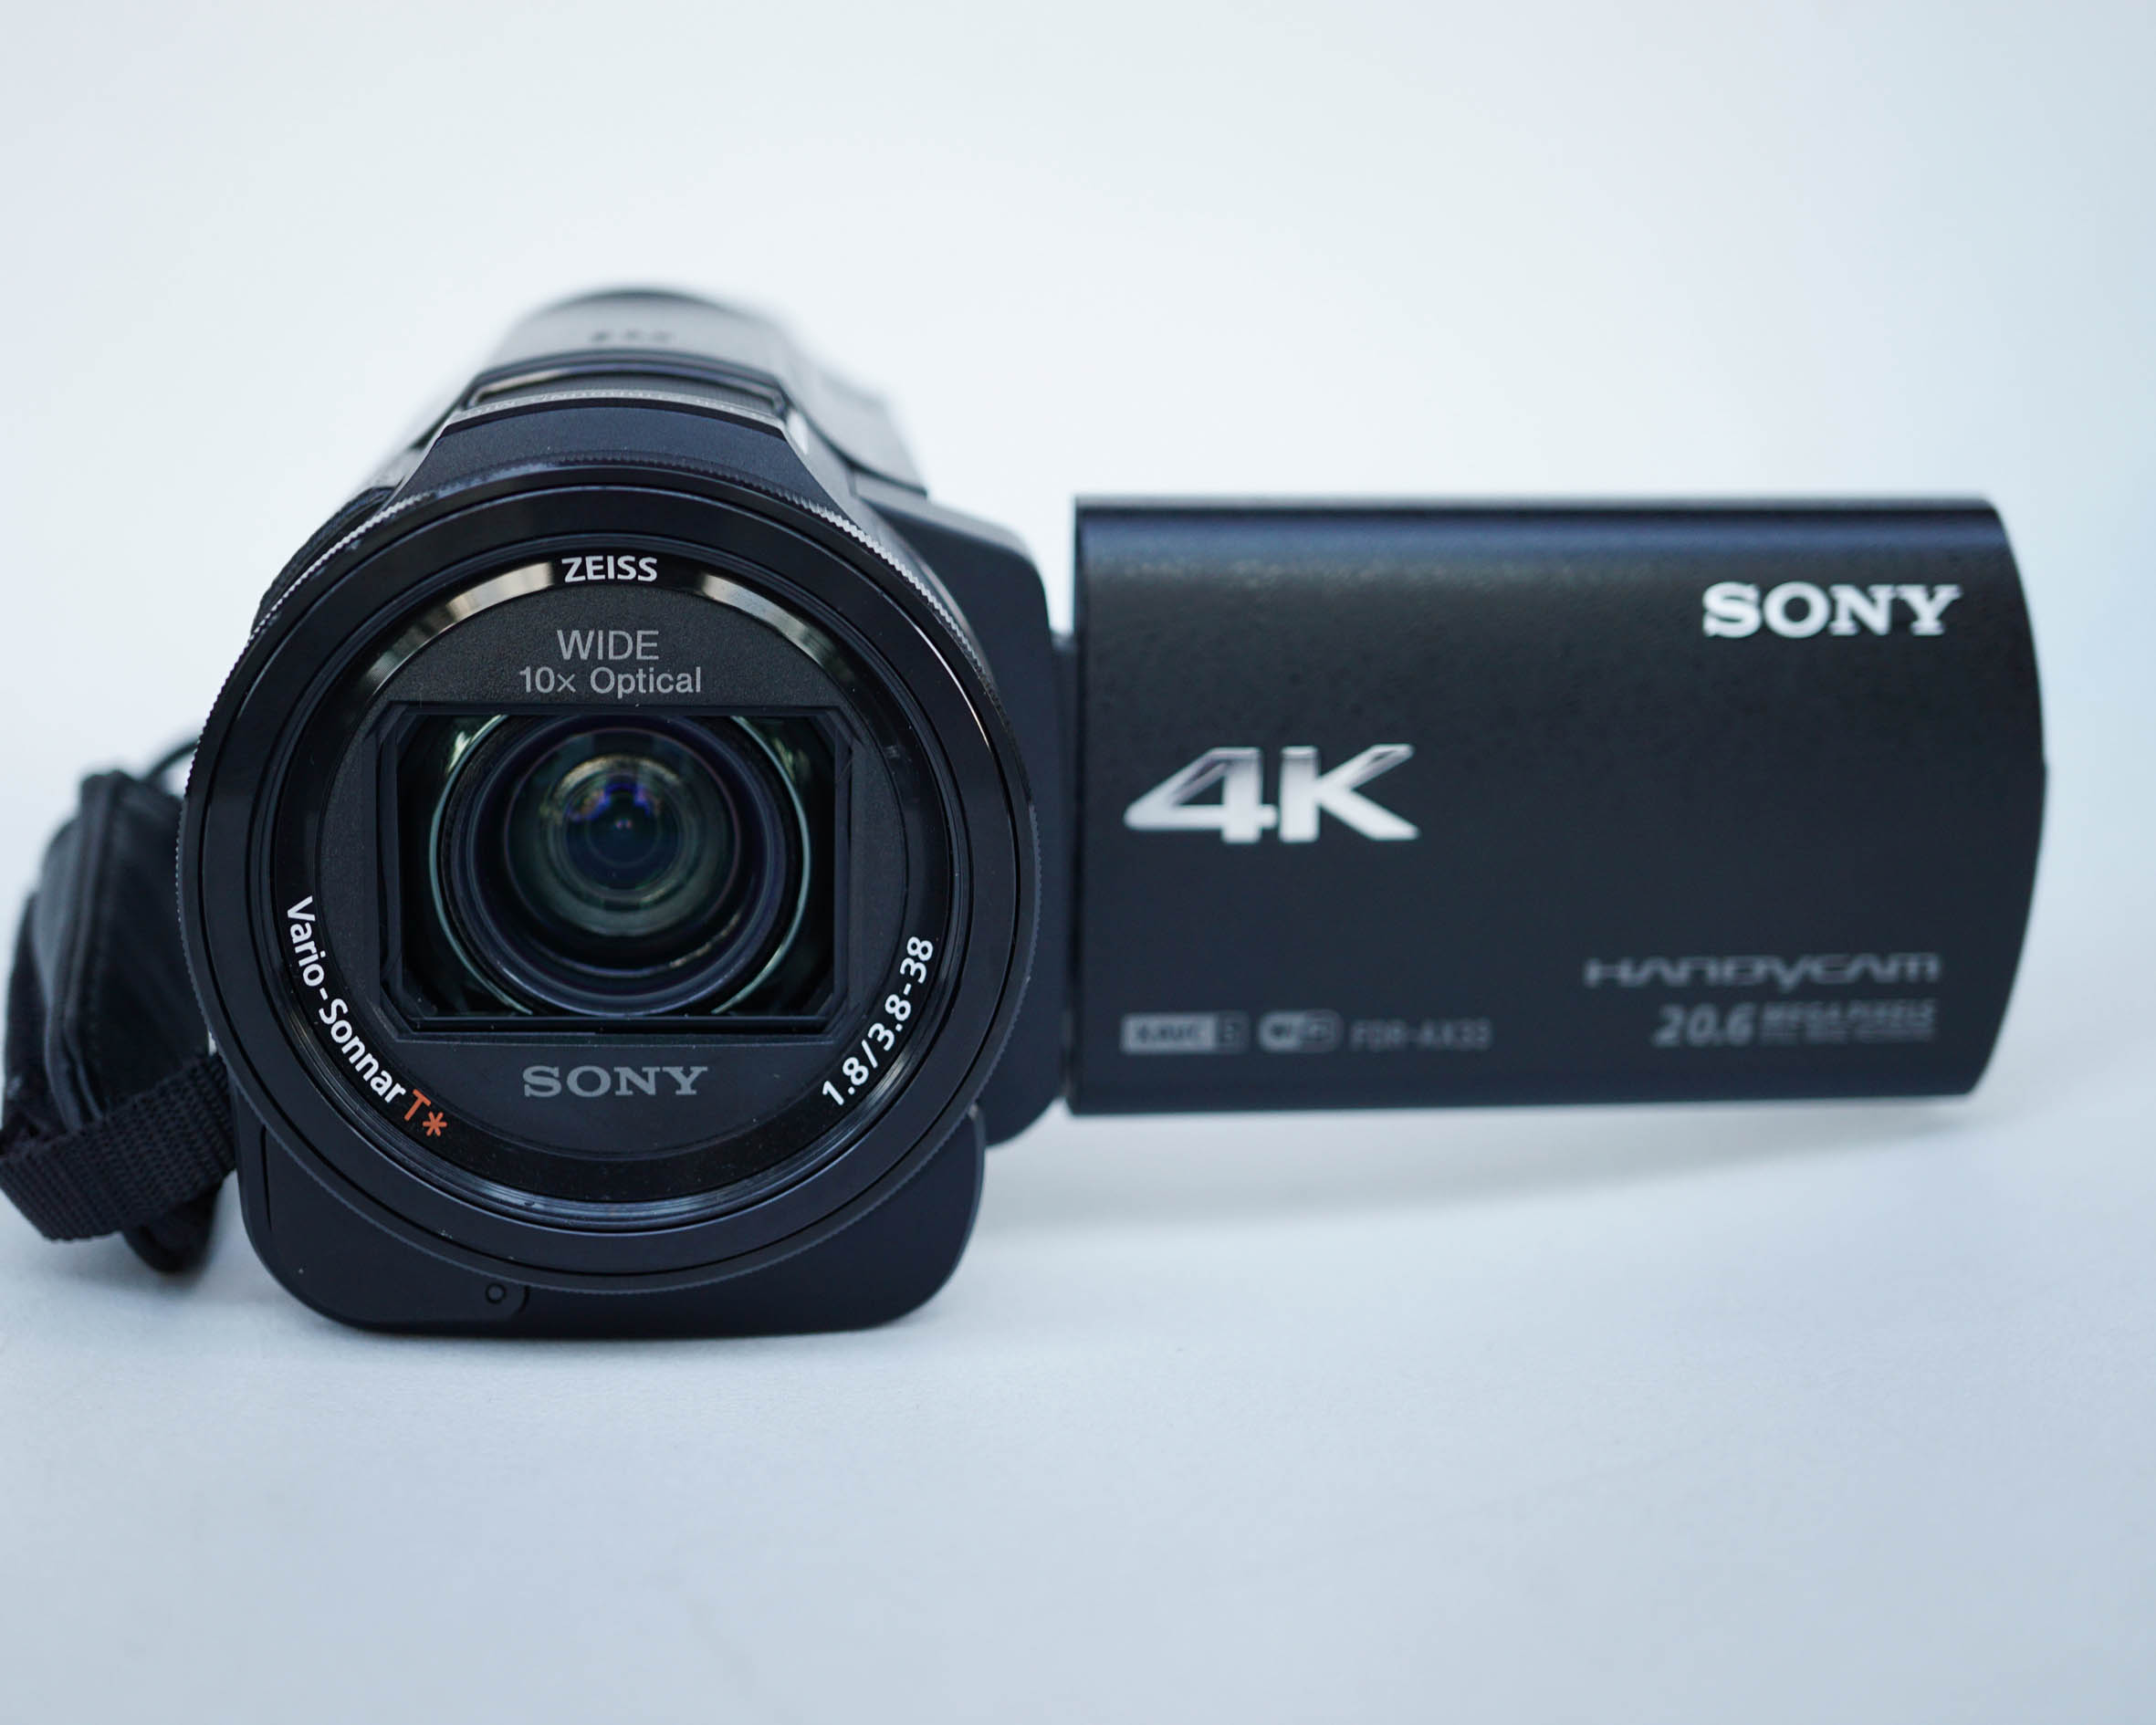 Sony Handycam FDR-AX33 4K Ultra HD